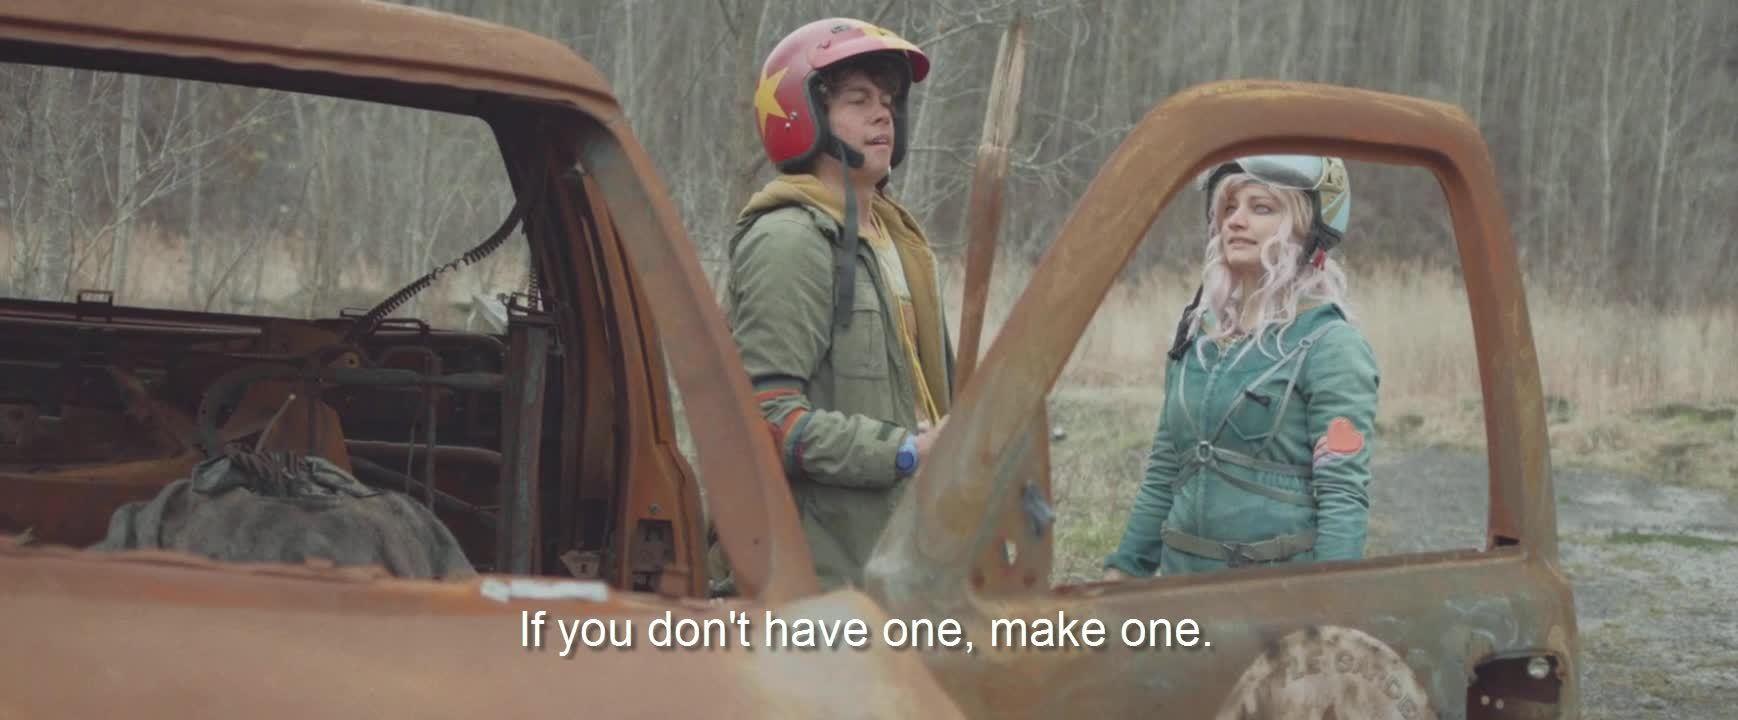 NetflixBestOf, Turbo Kid Gnomestick, Rule #6 of the wasteland: always have a weapon (reddit) GIFs